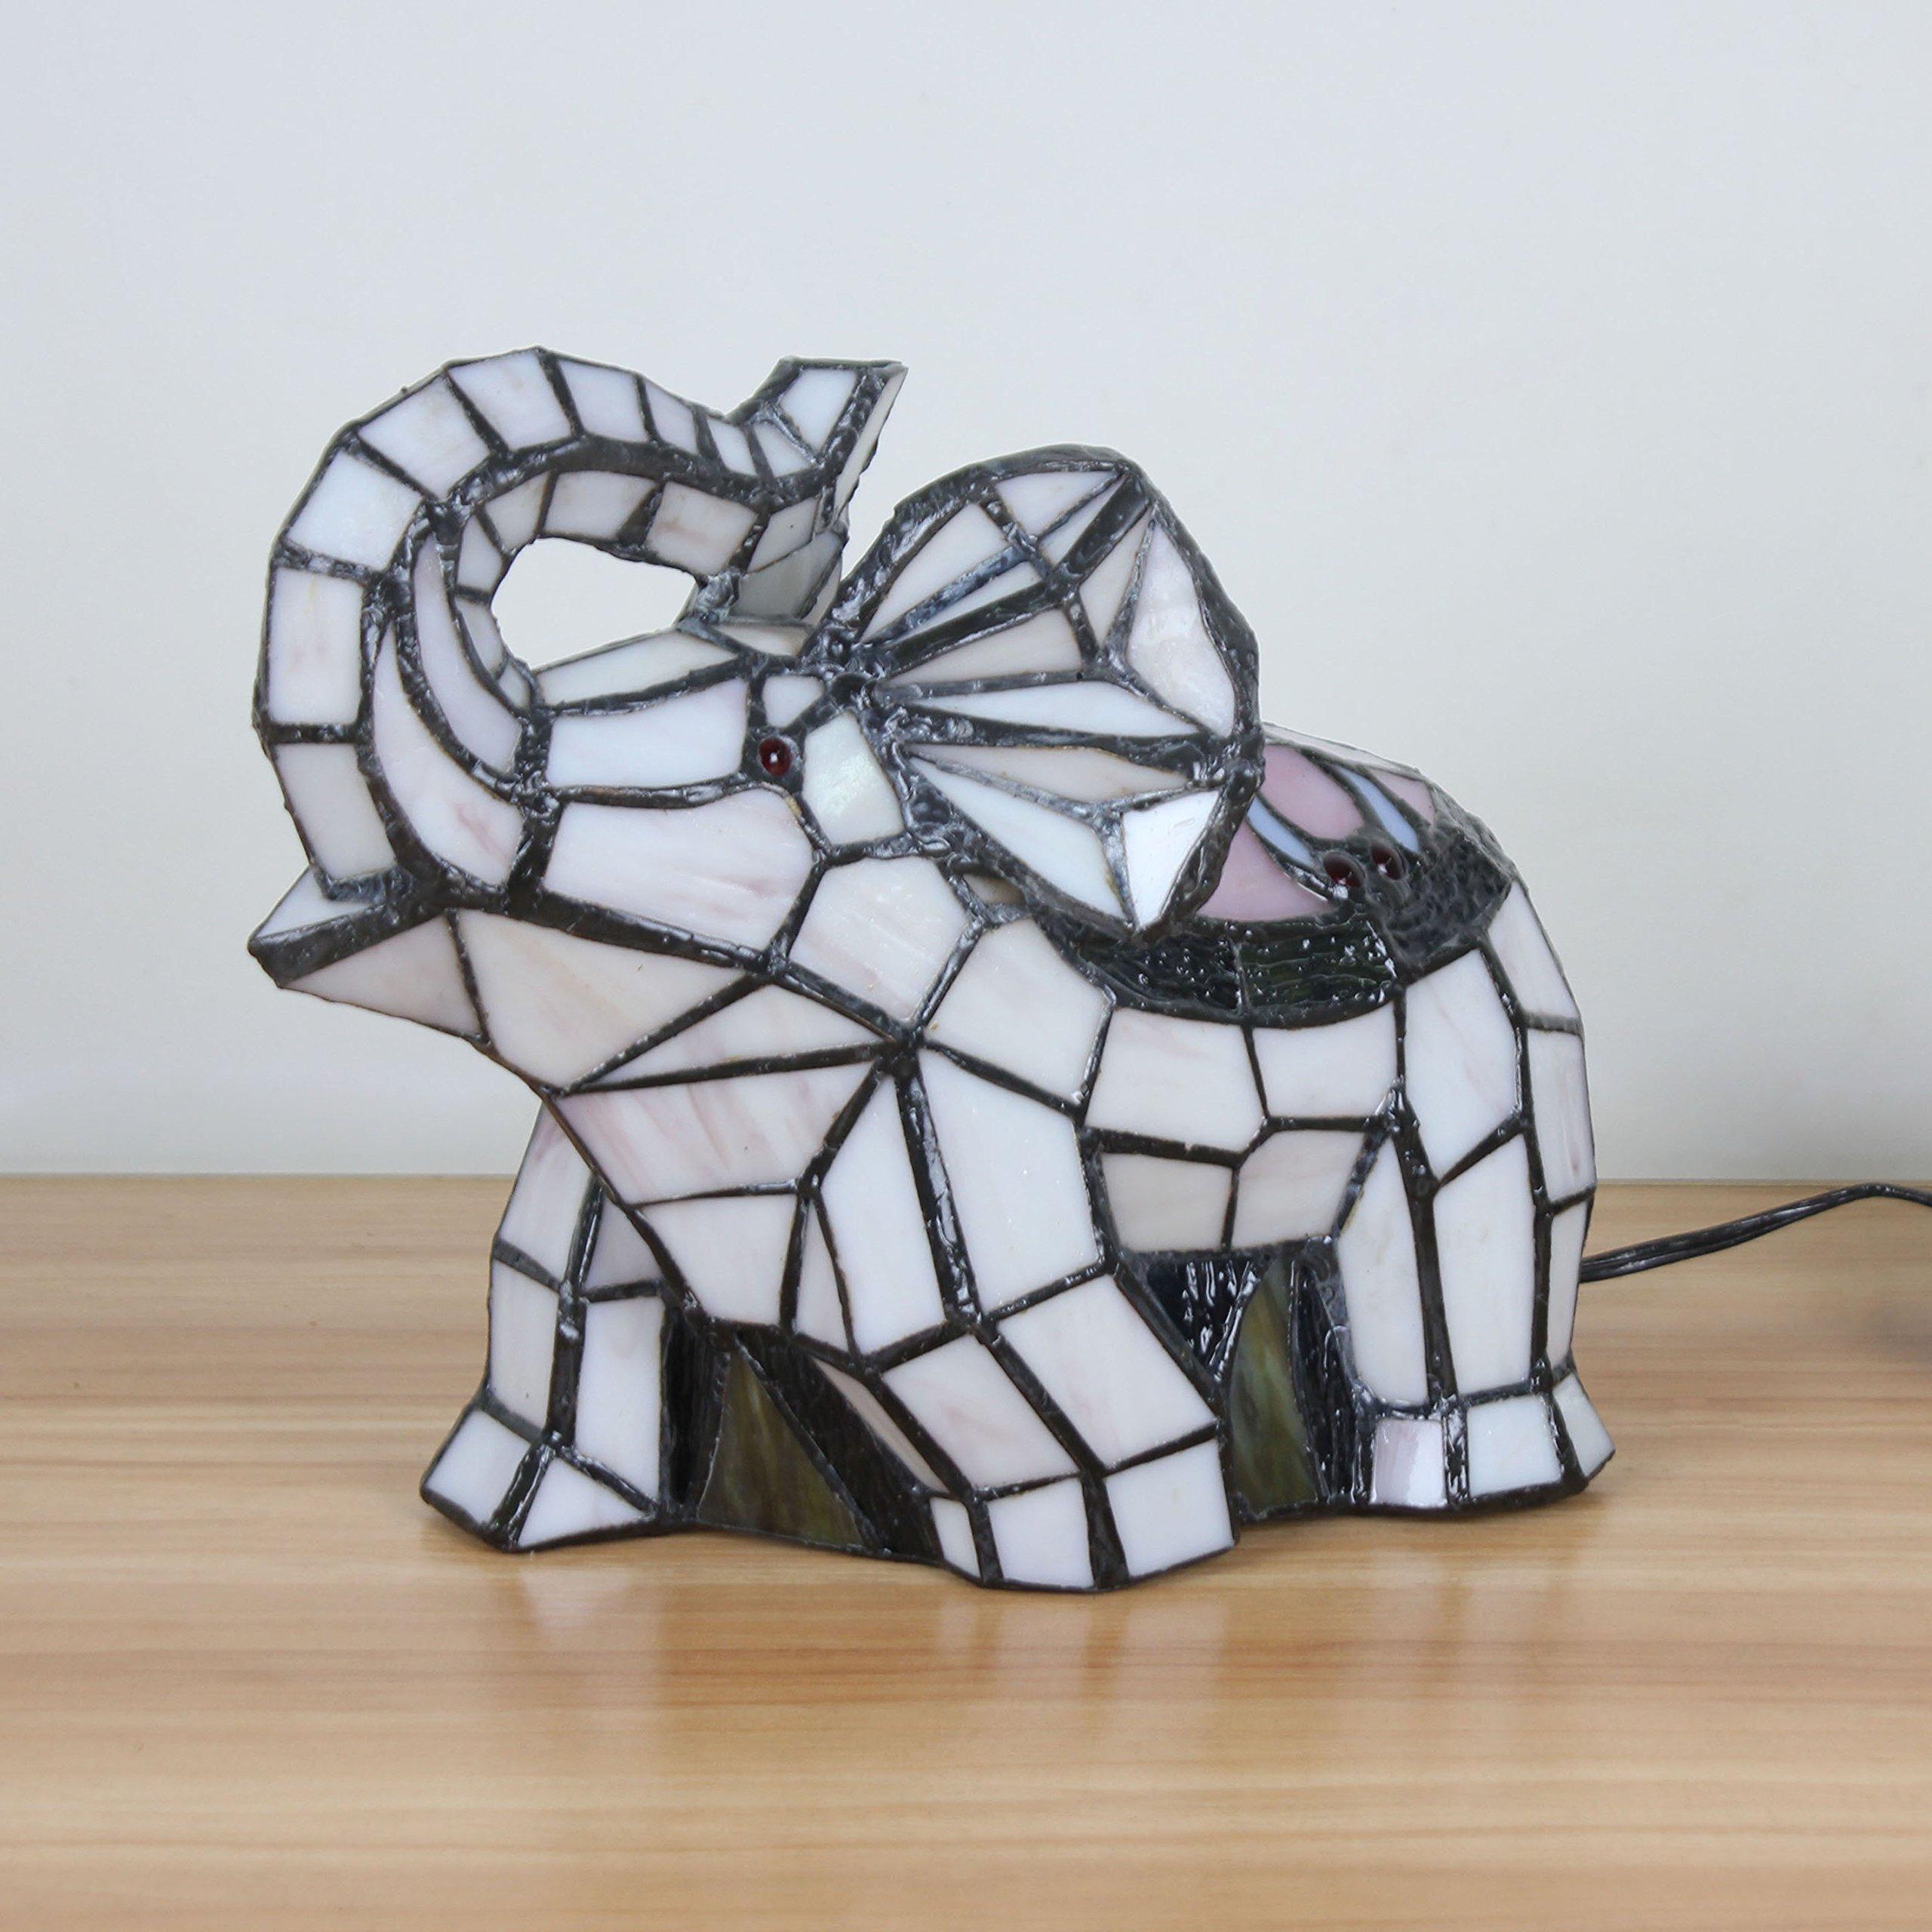 Royal-Tiffany Style Fresh Pastoral White Elephant Table Lamp Children's Lamp Night Light by Animal Night Light (Image #3)